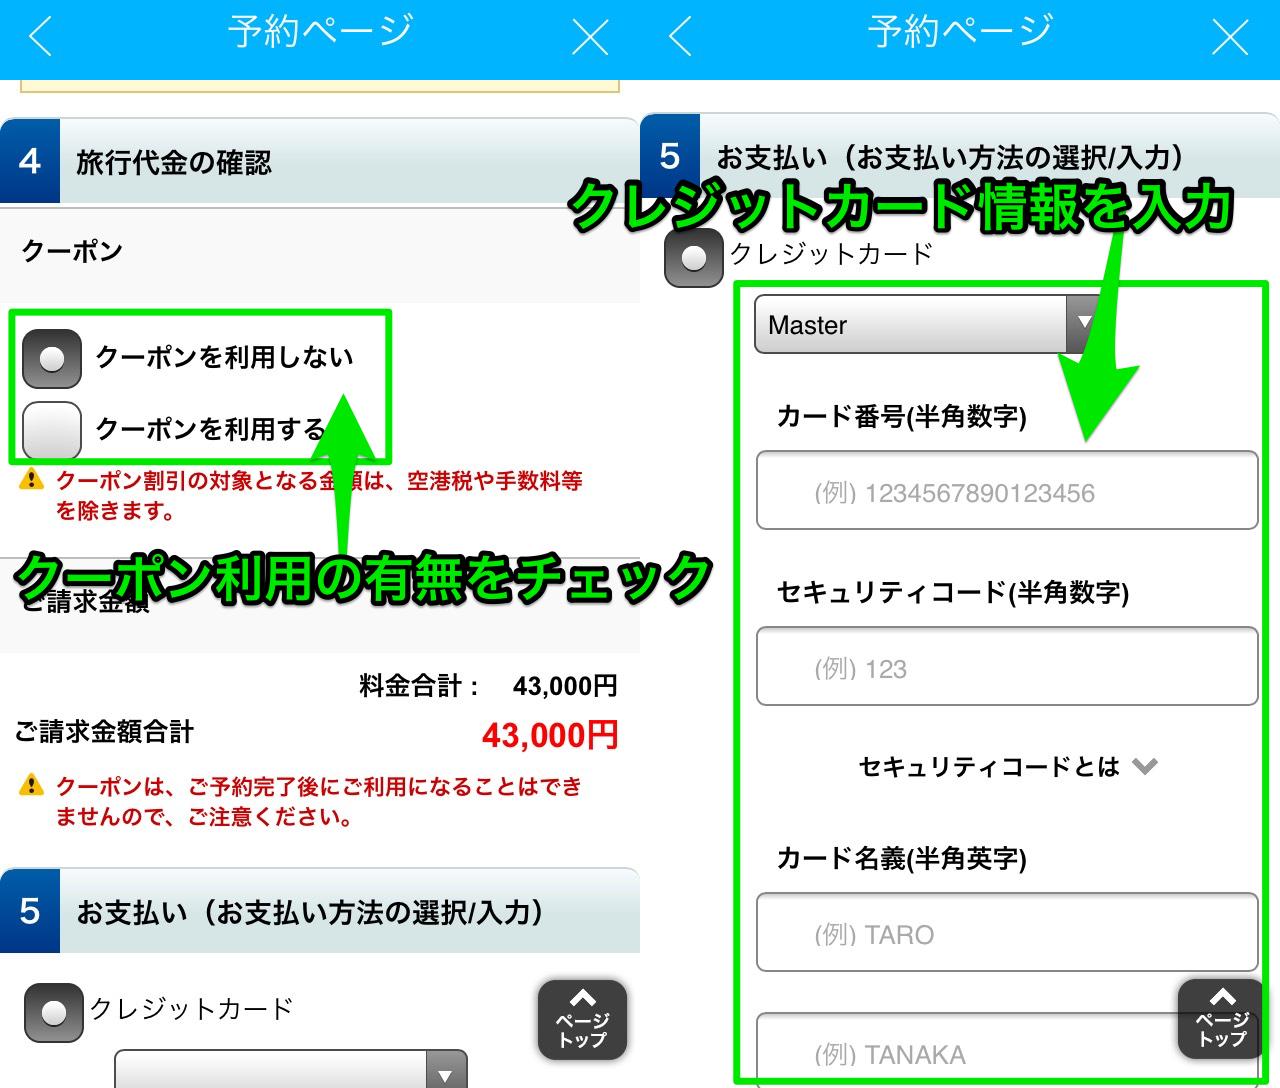 HISアプリ「航空券・ホテル」でクーポン利用画面